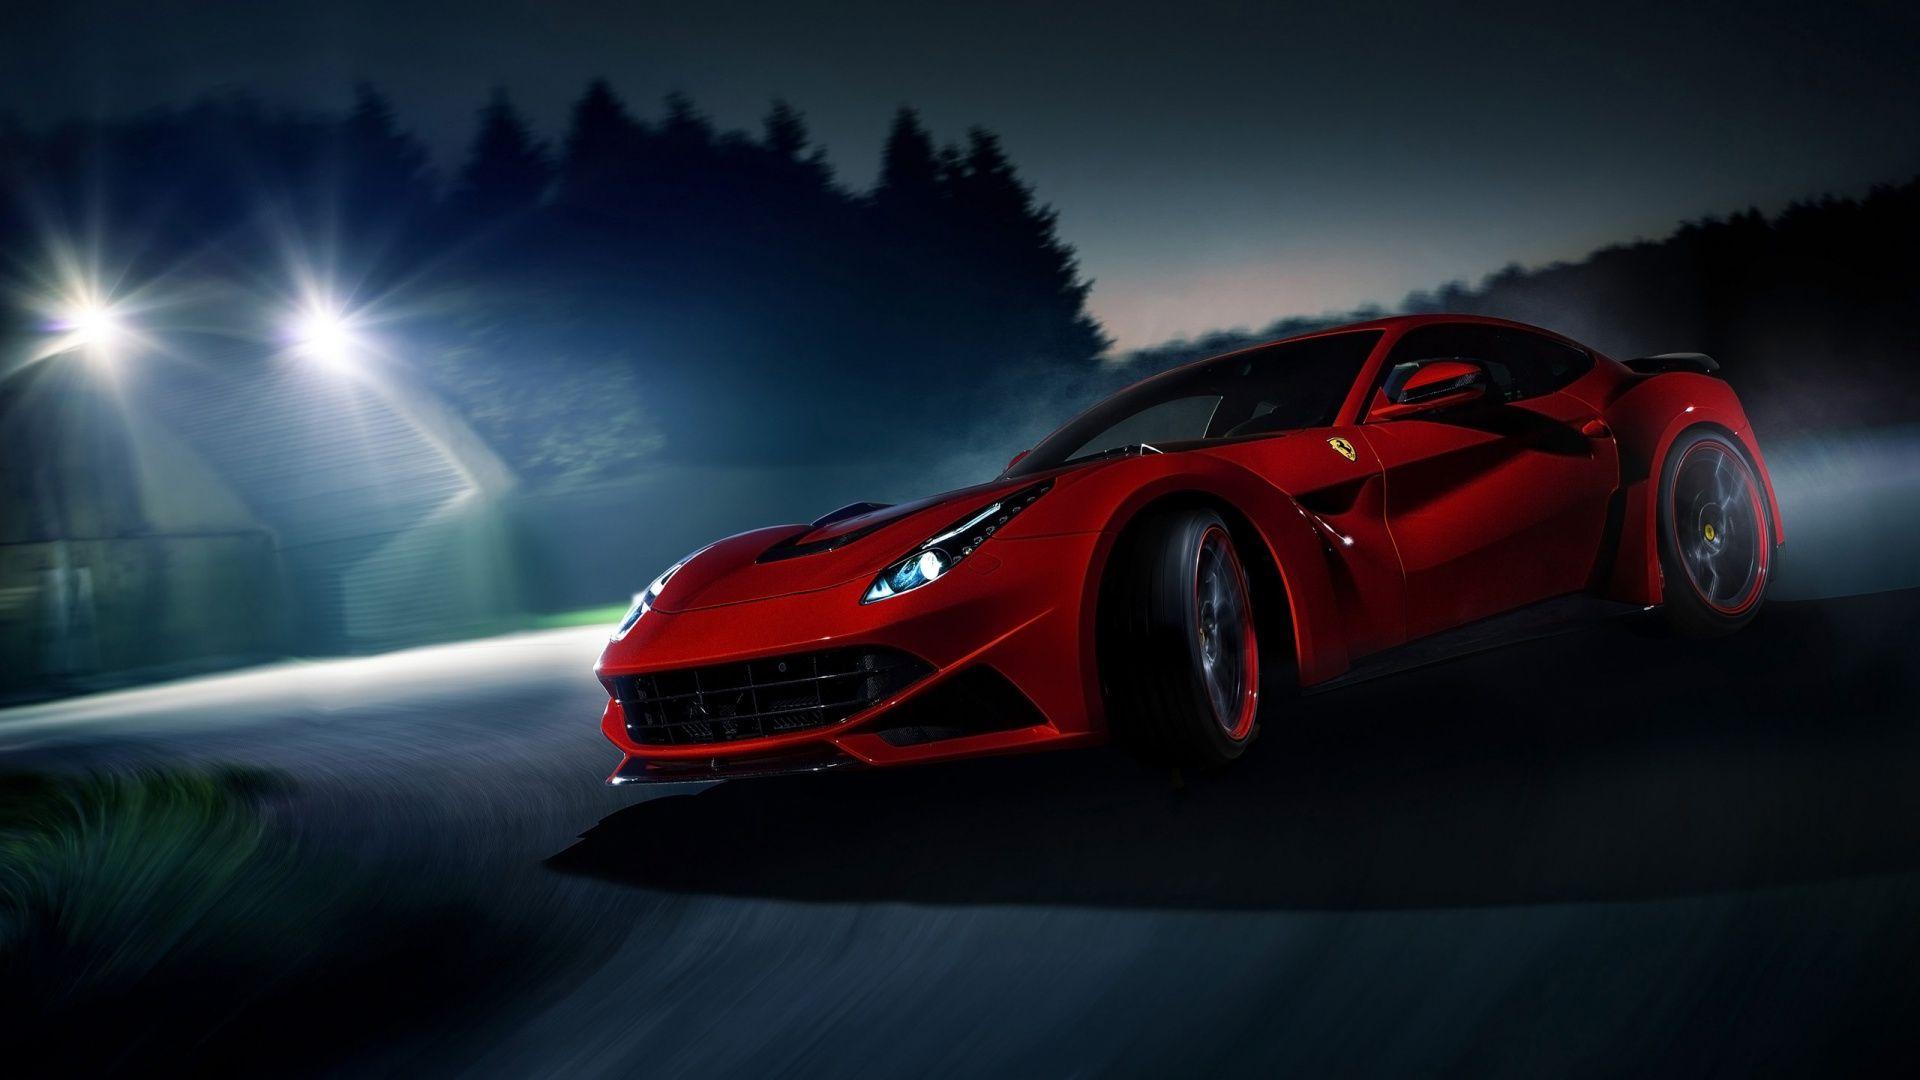 Image For 2014 Novitec Rosso Ferrari Berlinetta N Largo Car Hd Wallpaper Gallery